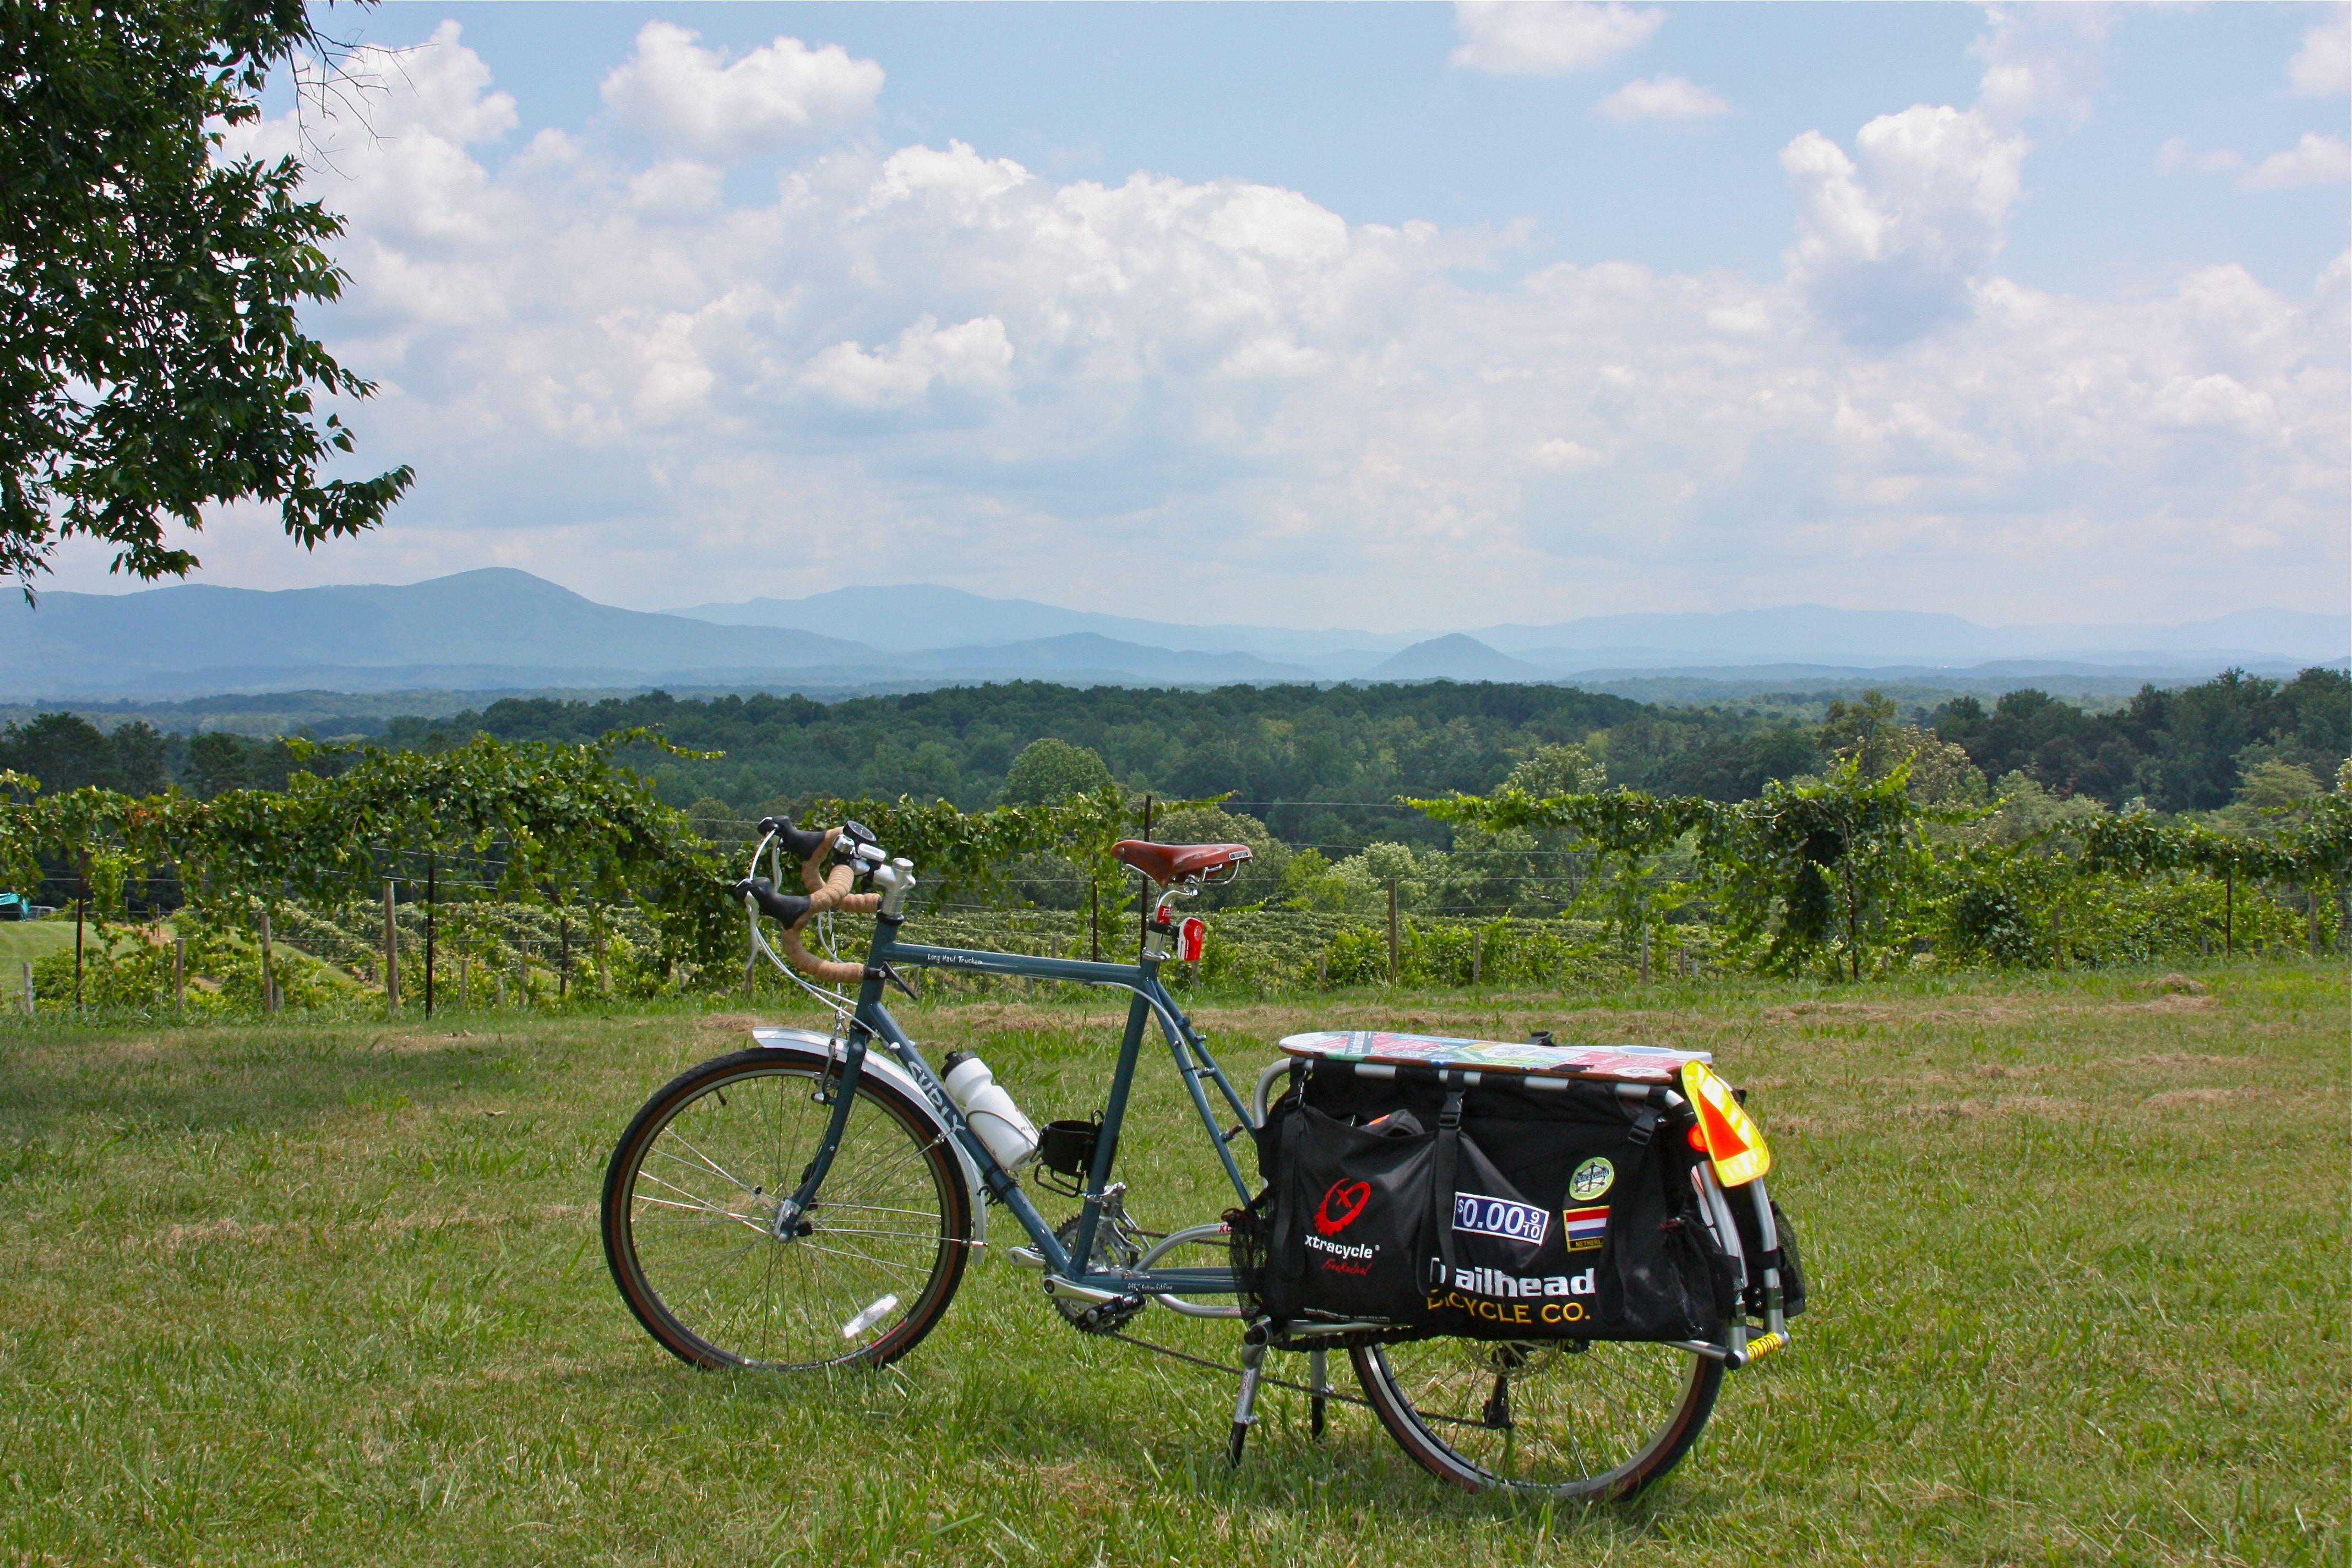 One of the prettiest vistas in the county - Morris Vineyard